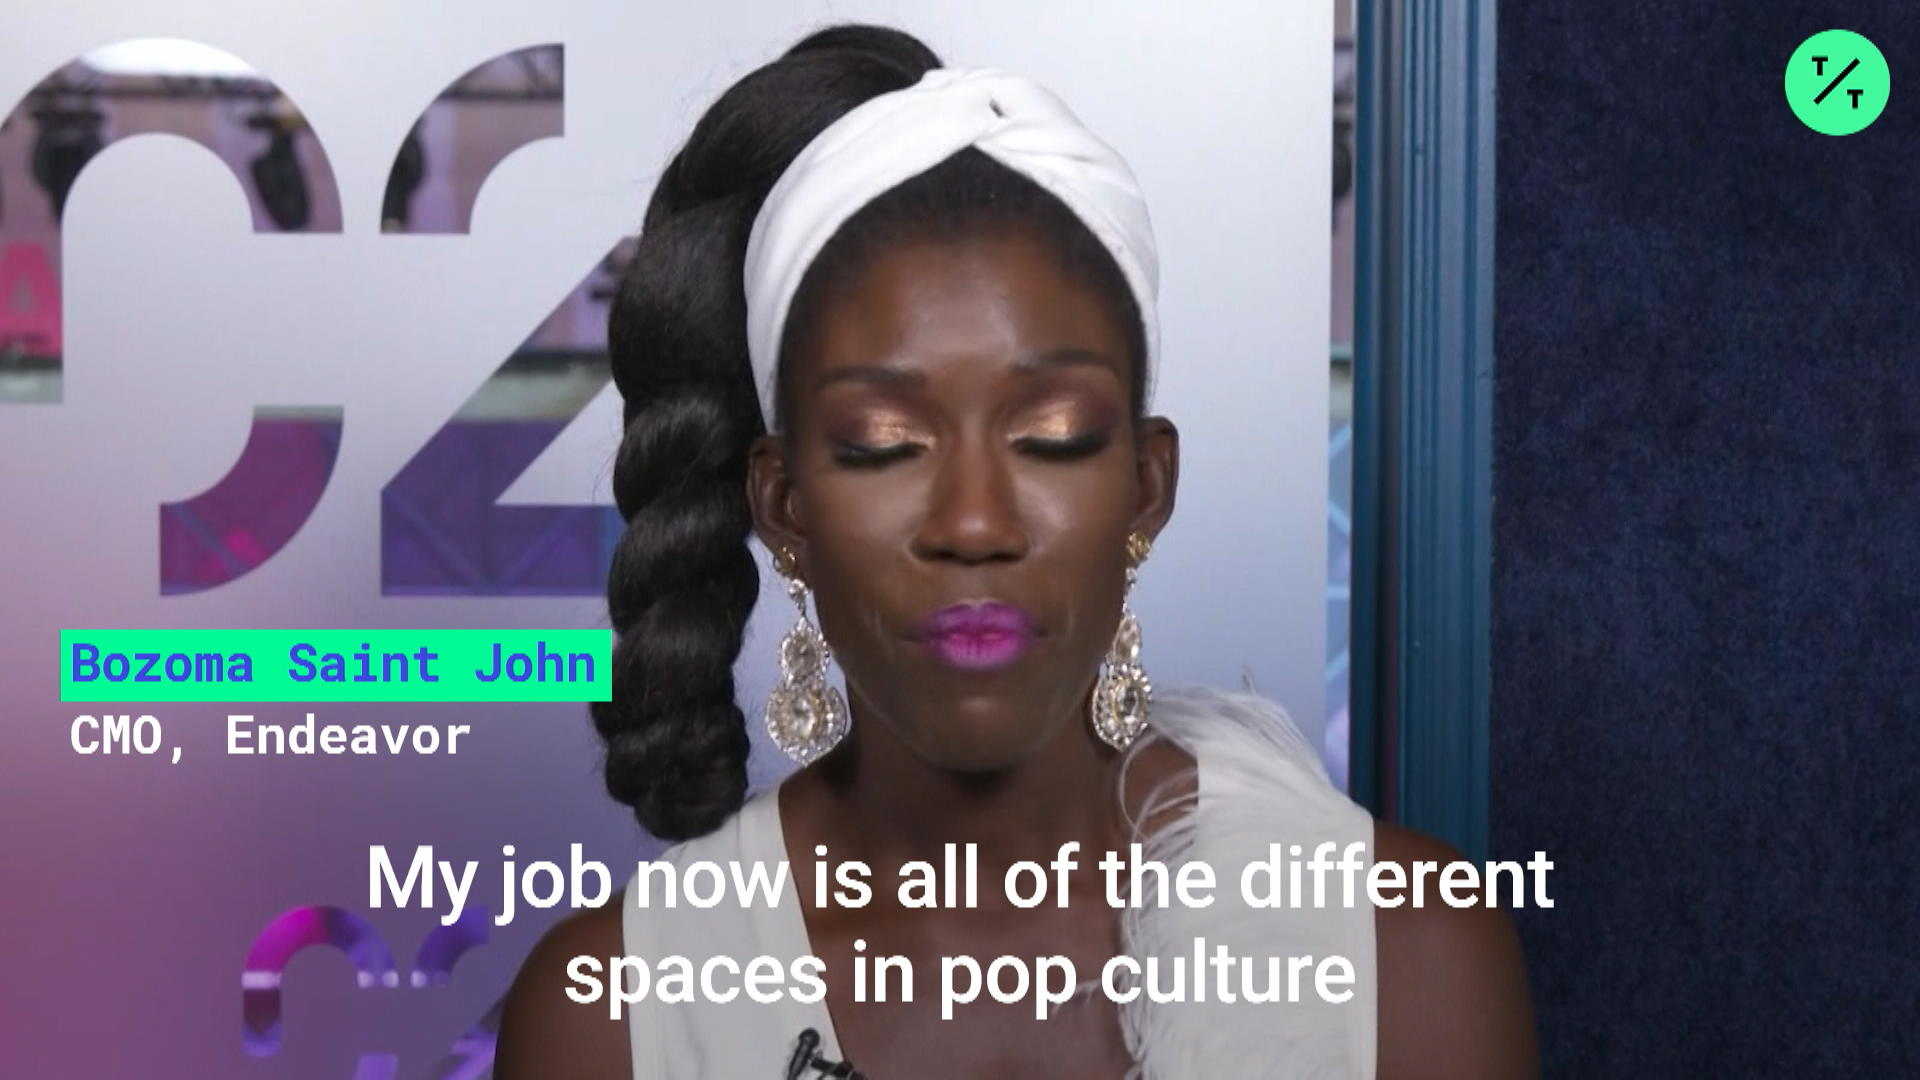 Bozoma Saint John on Work at Endeavor